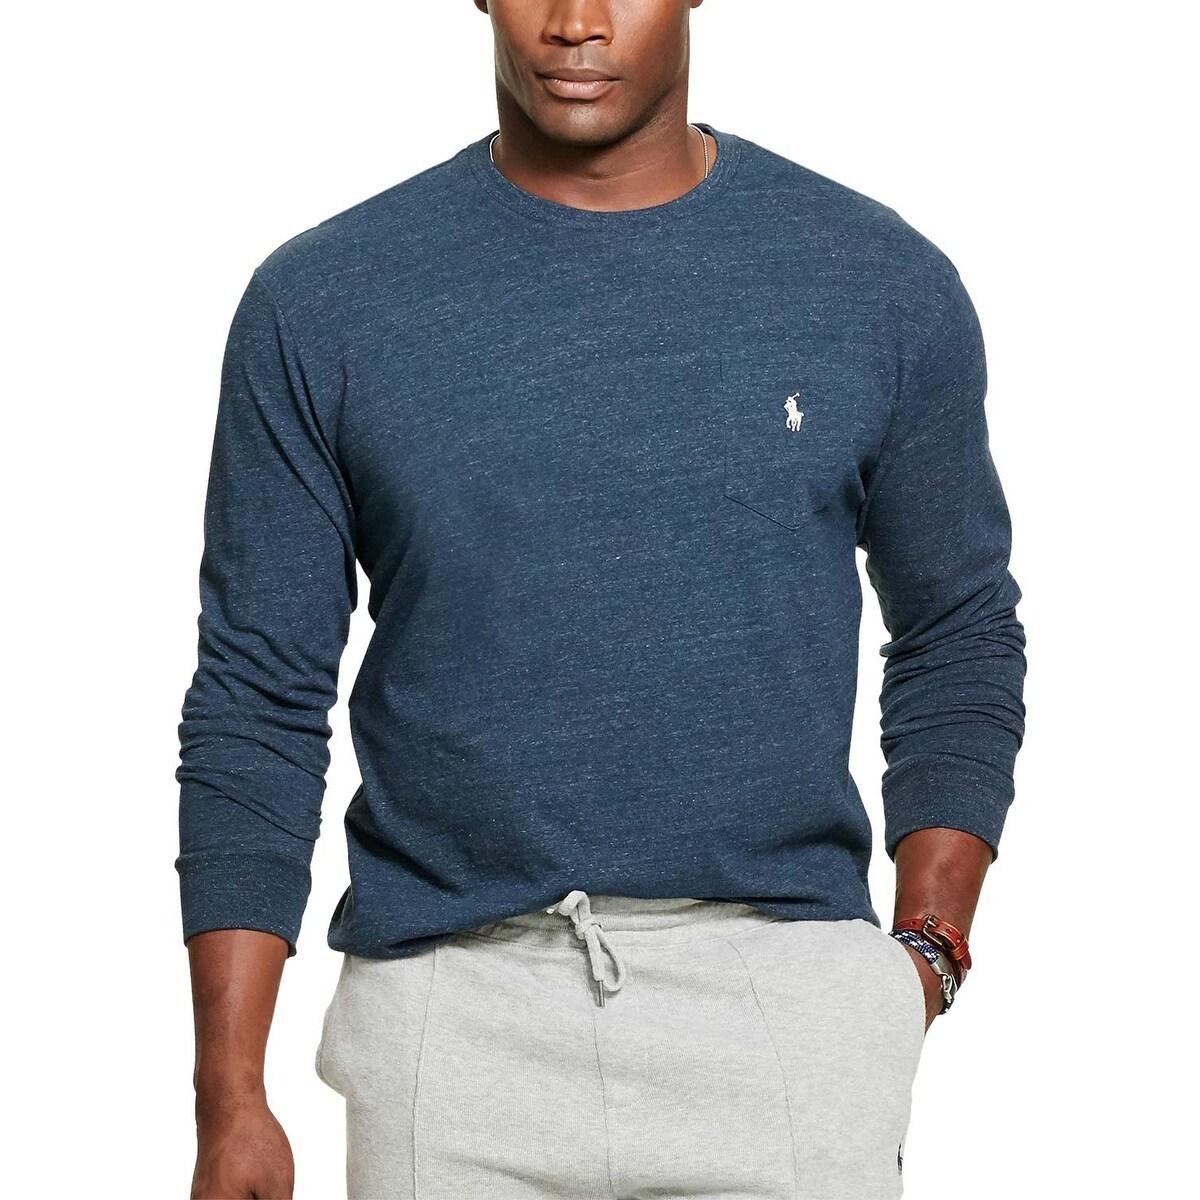 fcbc9a63 Polo Ralph Lauren T Shirts Xlt